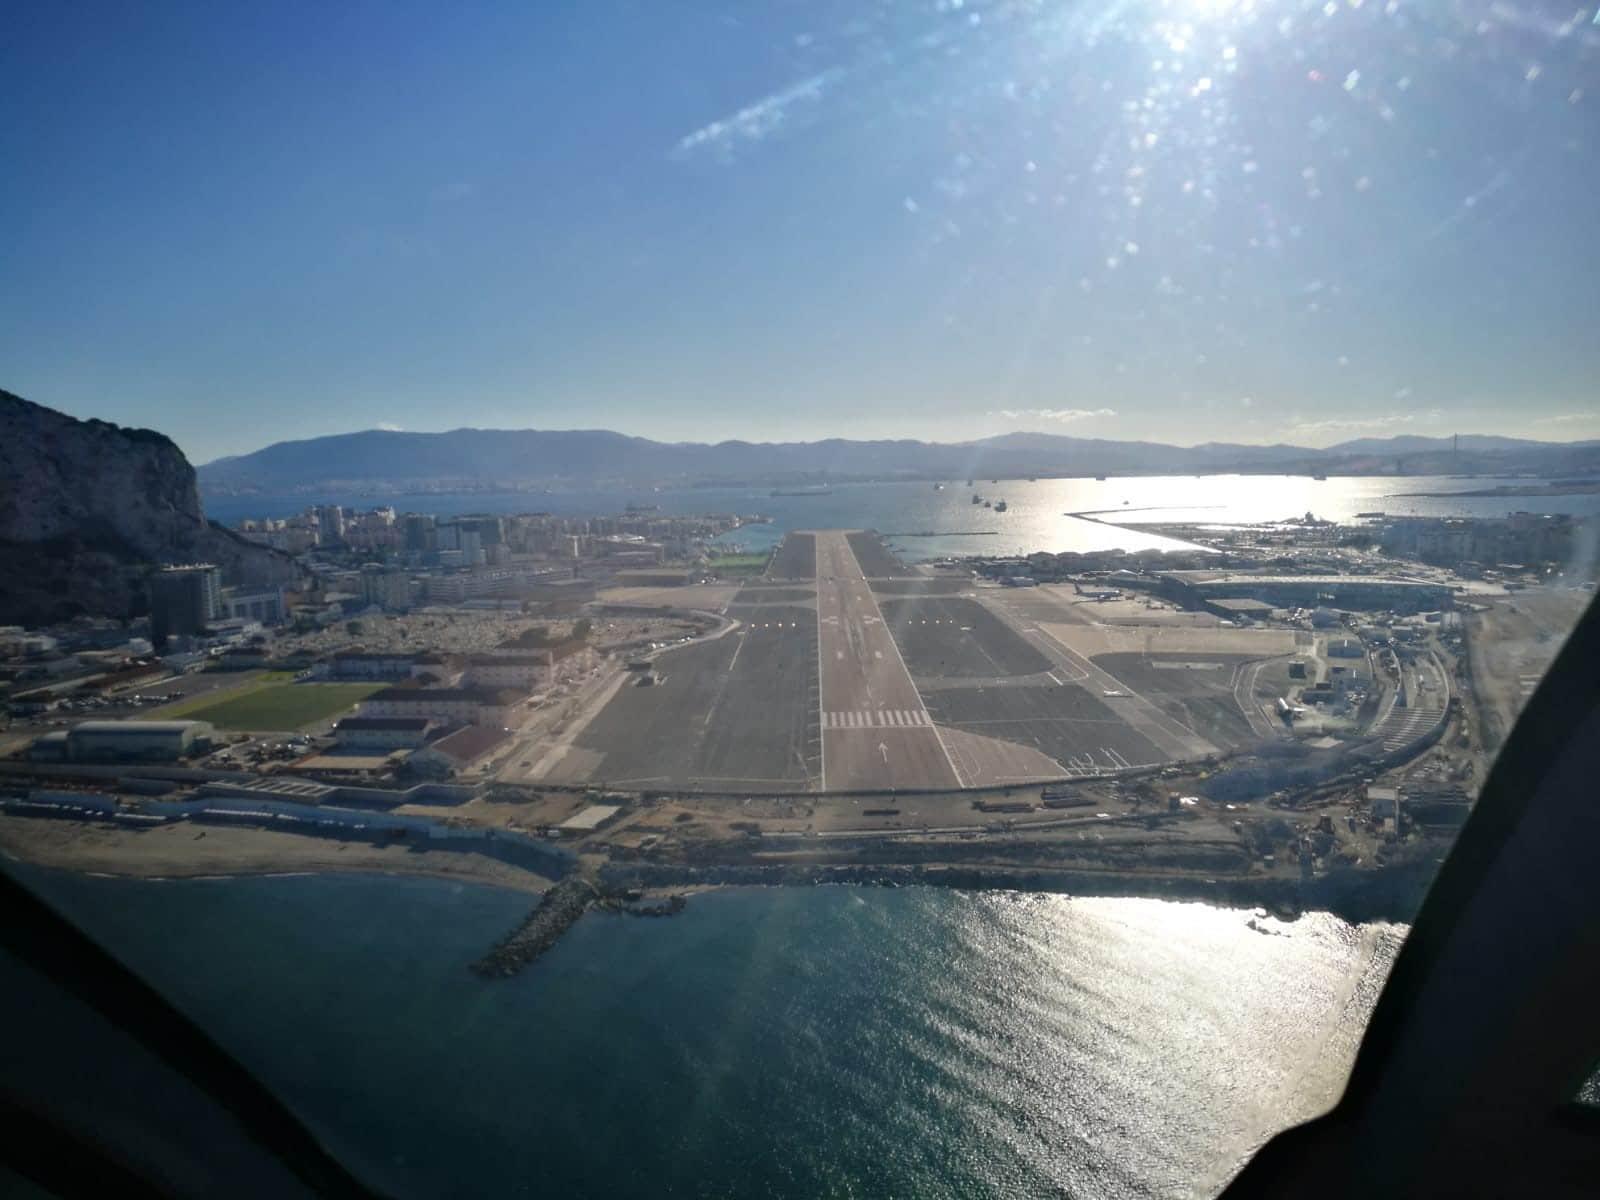 23-jun-2019-blogueros-espaoles-de-viajes-visitan-el-pen_48114555162_o